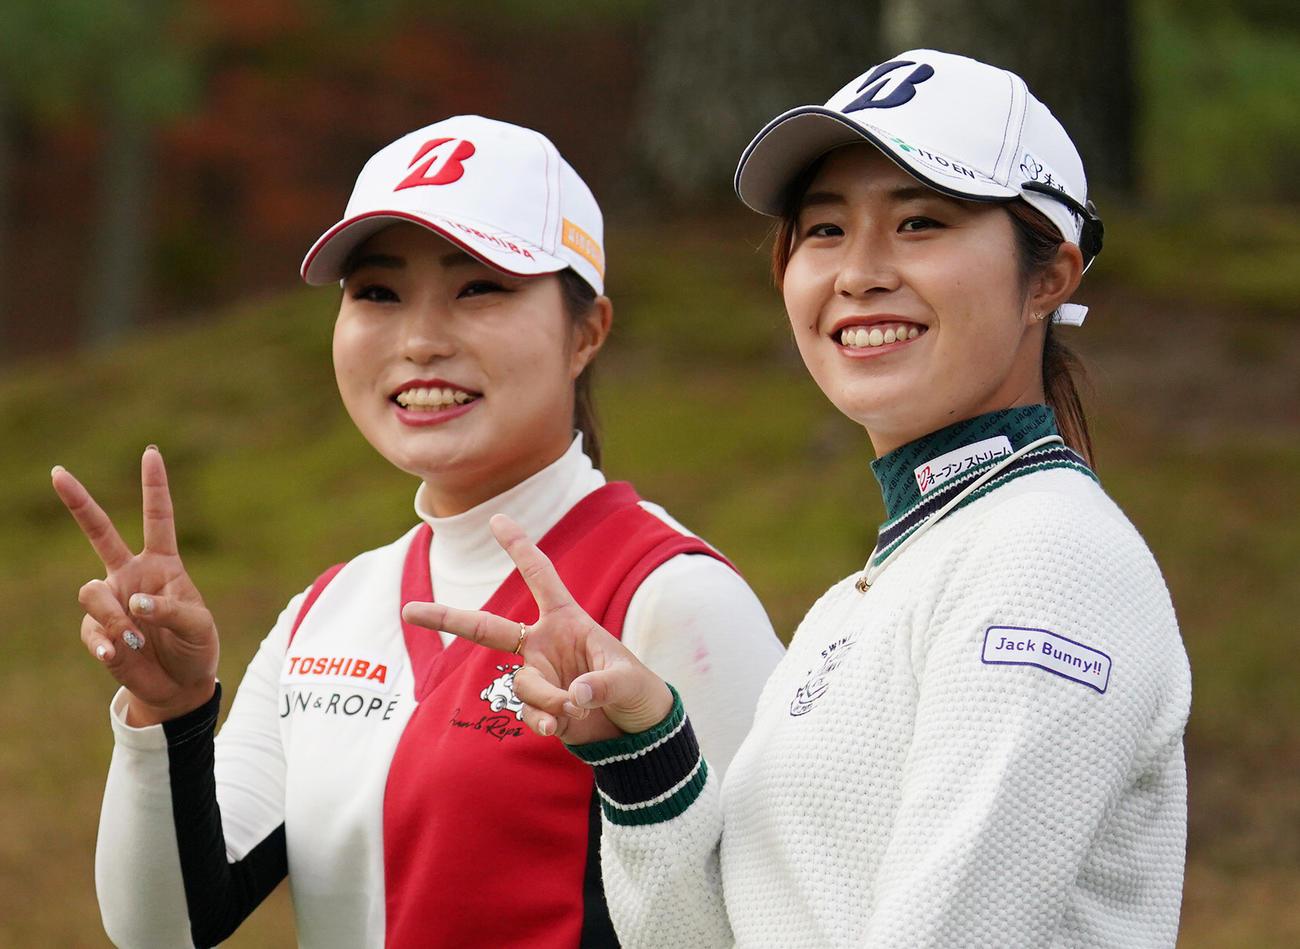 https://www.nikkansports.com/sports/golf/news/img/202011220000103-w1300_0.jpg